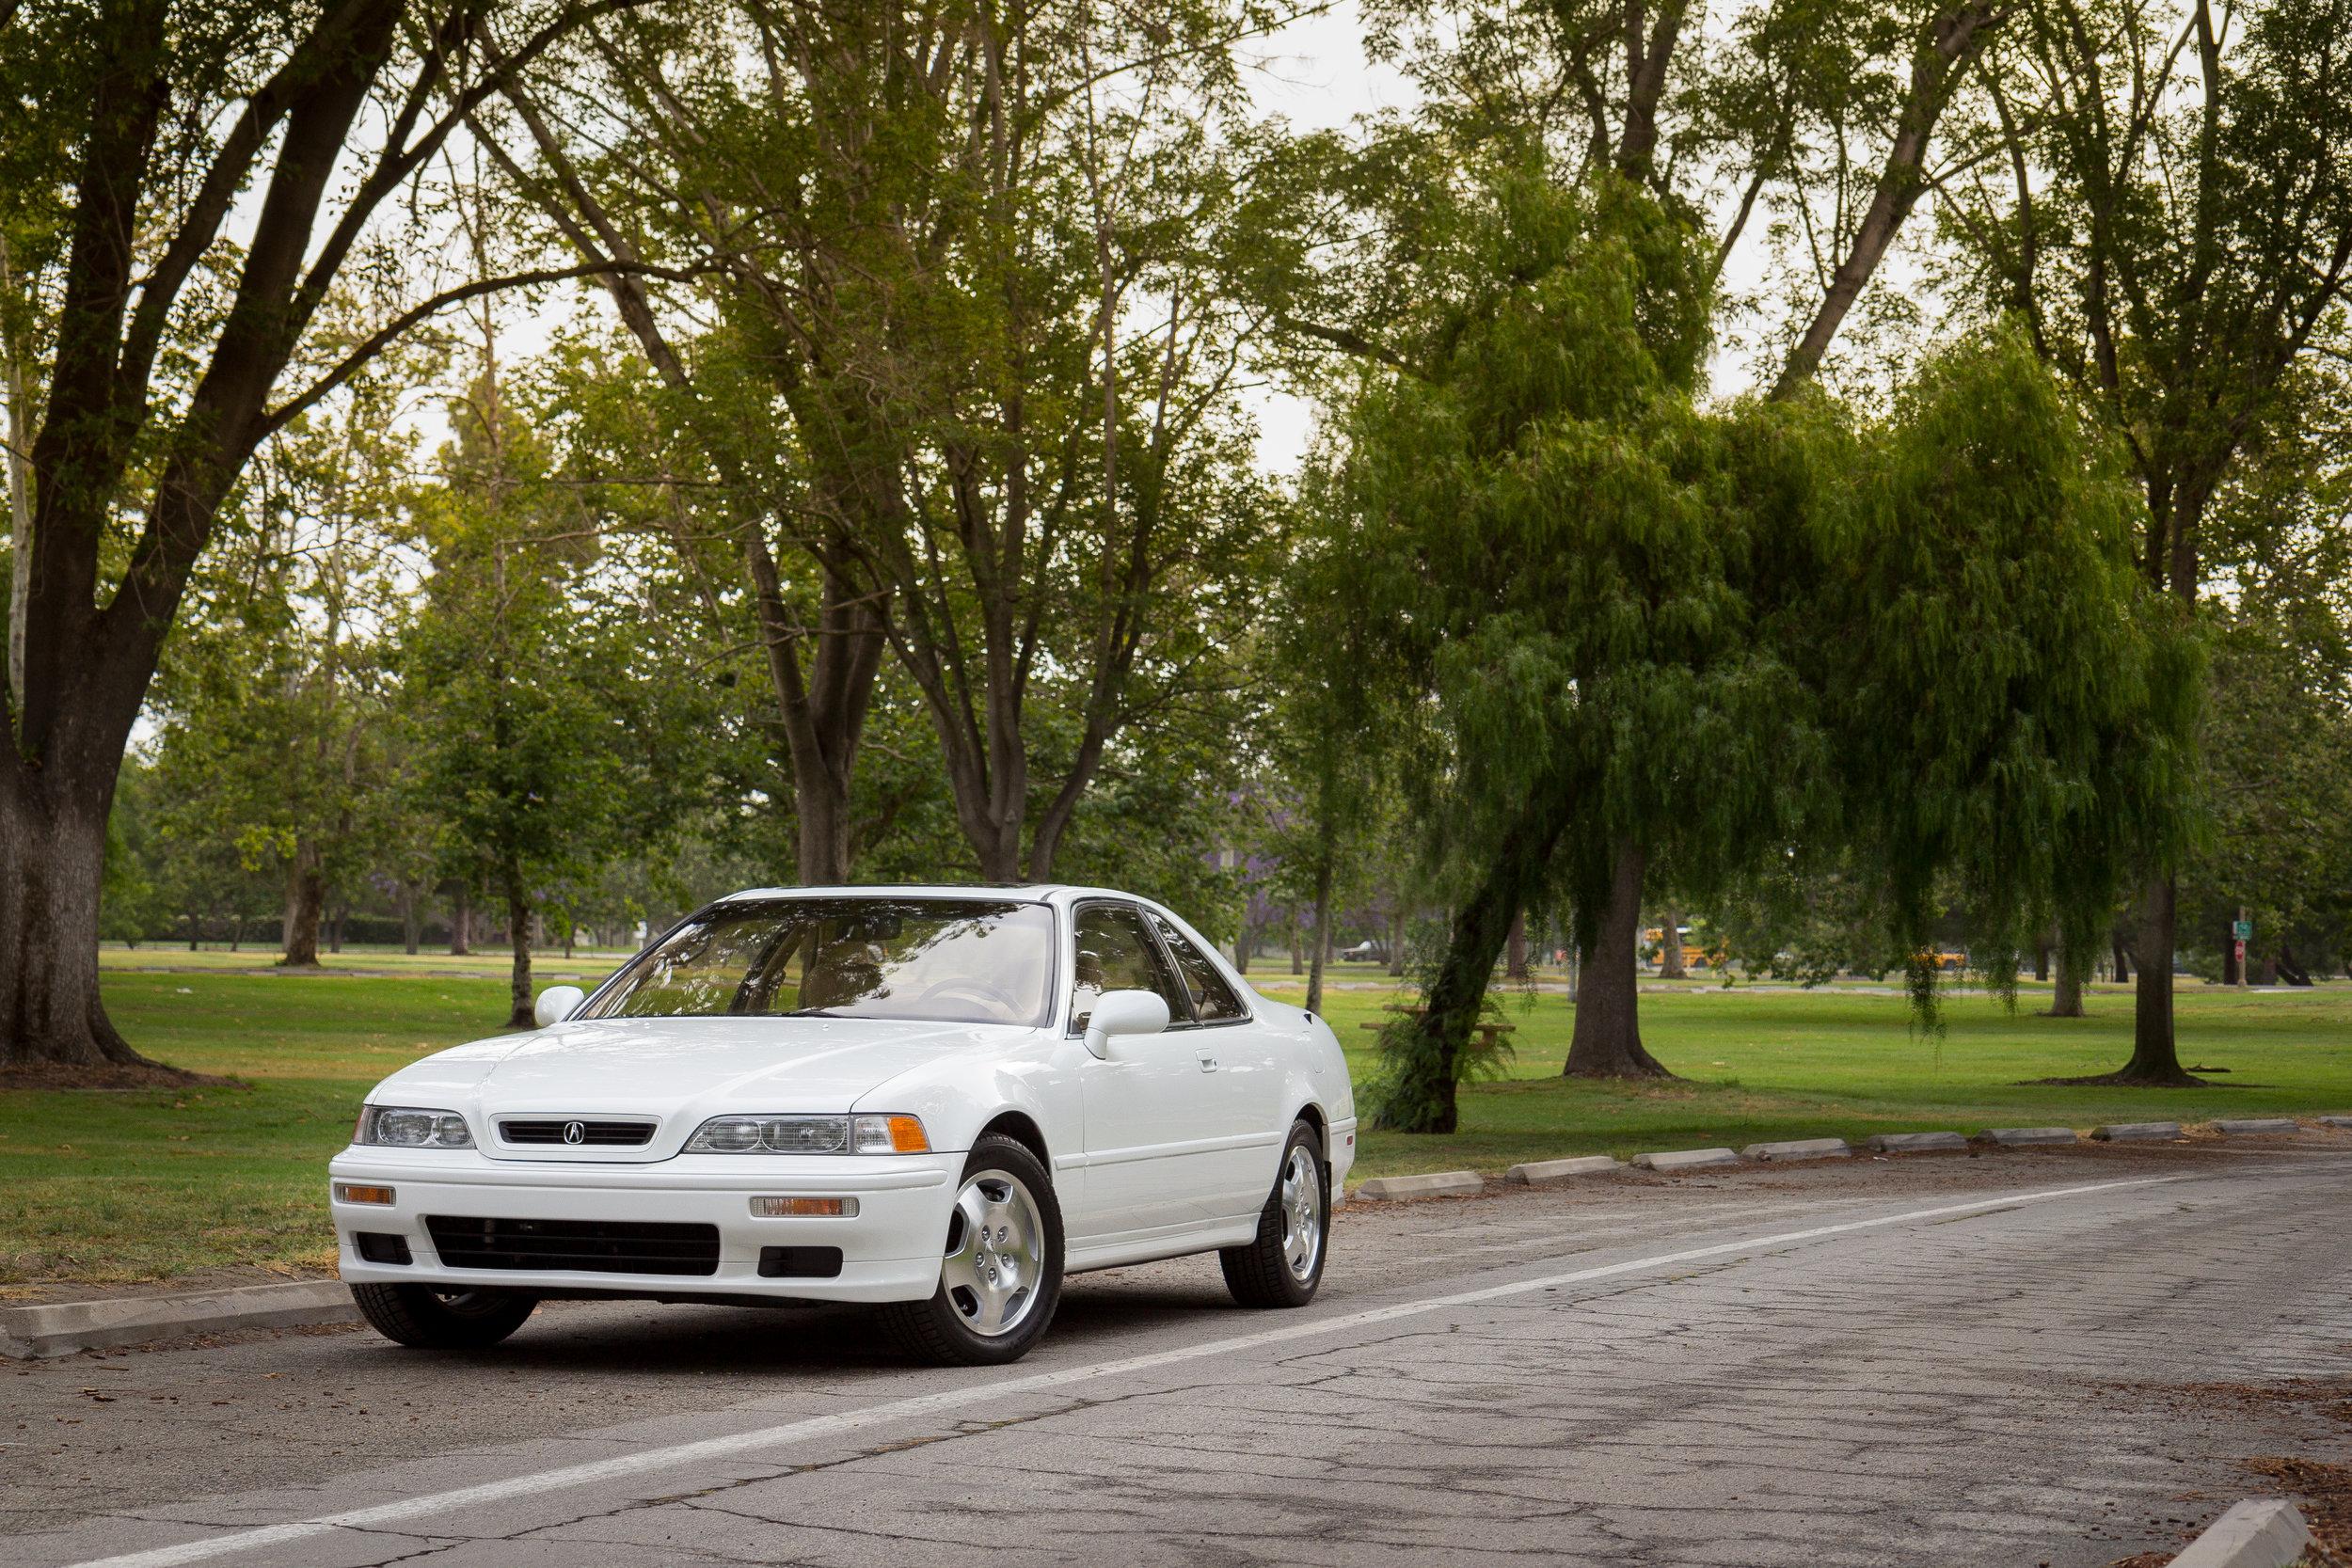 1994 Acura Legend Coupe-14.JPG